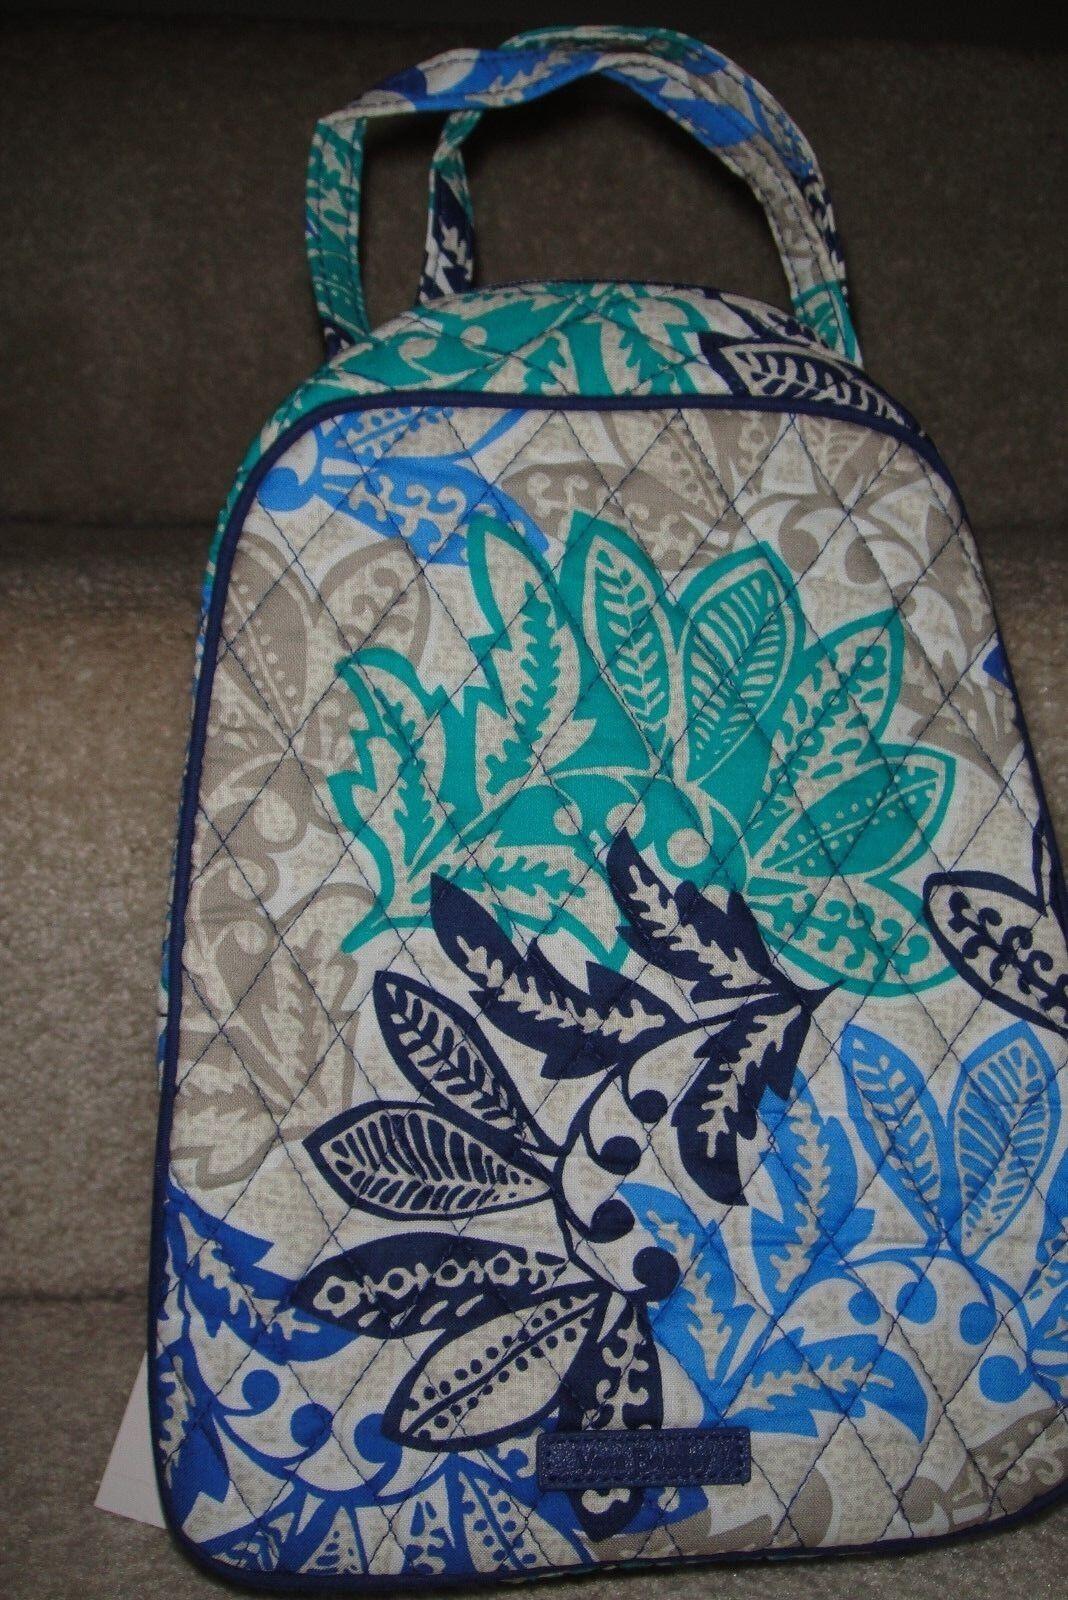 Vera bradley lunch bunch bag santiago ebay jpg 1068x1600 Cuban tiles lunch  sack a7116579b23e9